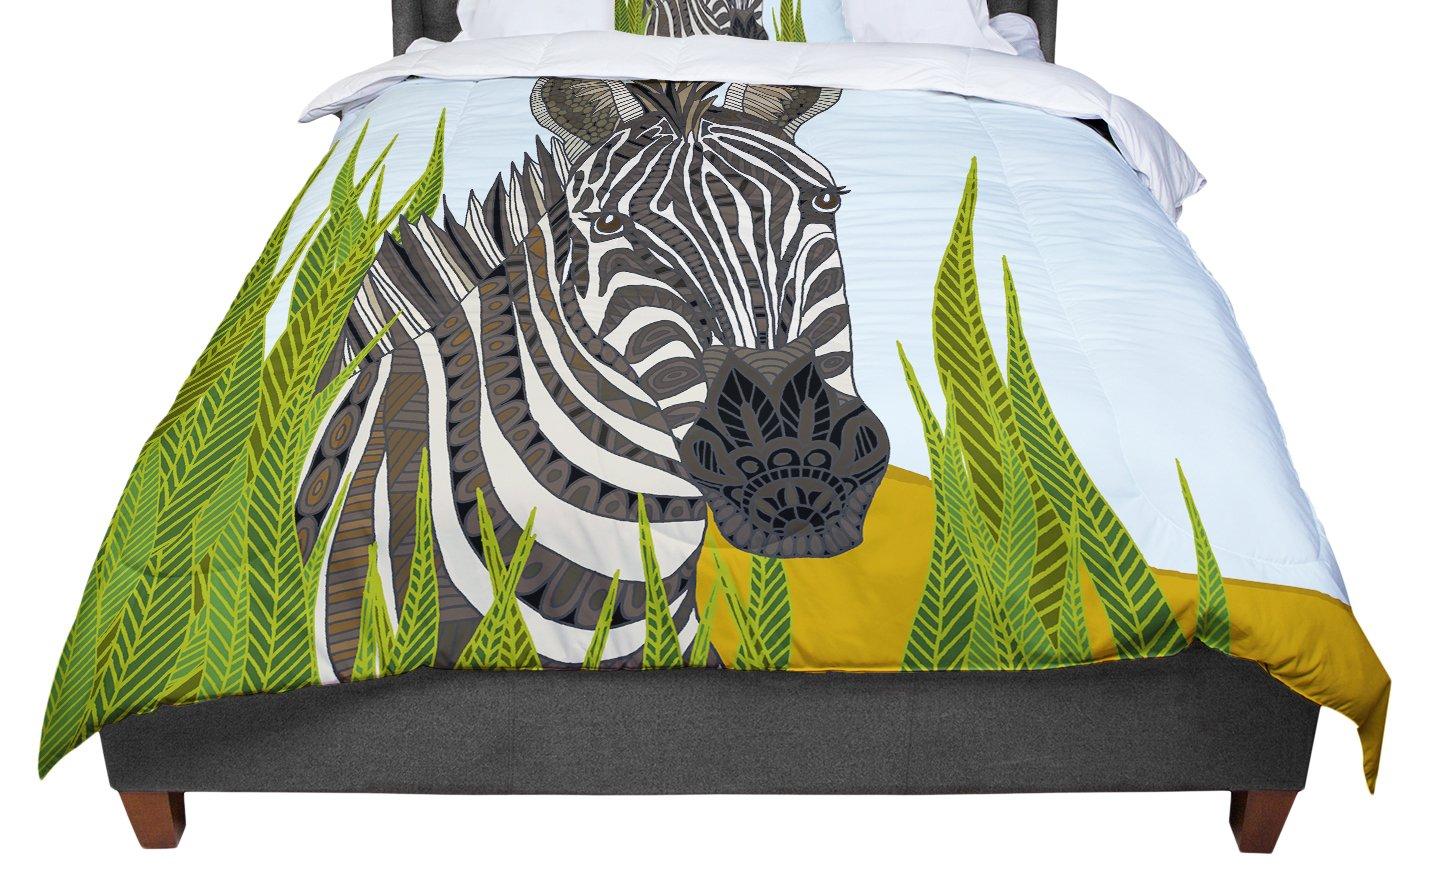 KESS InHouse Art Love Passion 'Zebra' Black White King / Cal King Comforter, 104' X 88'